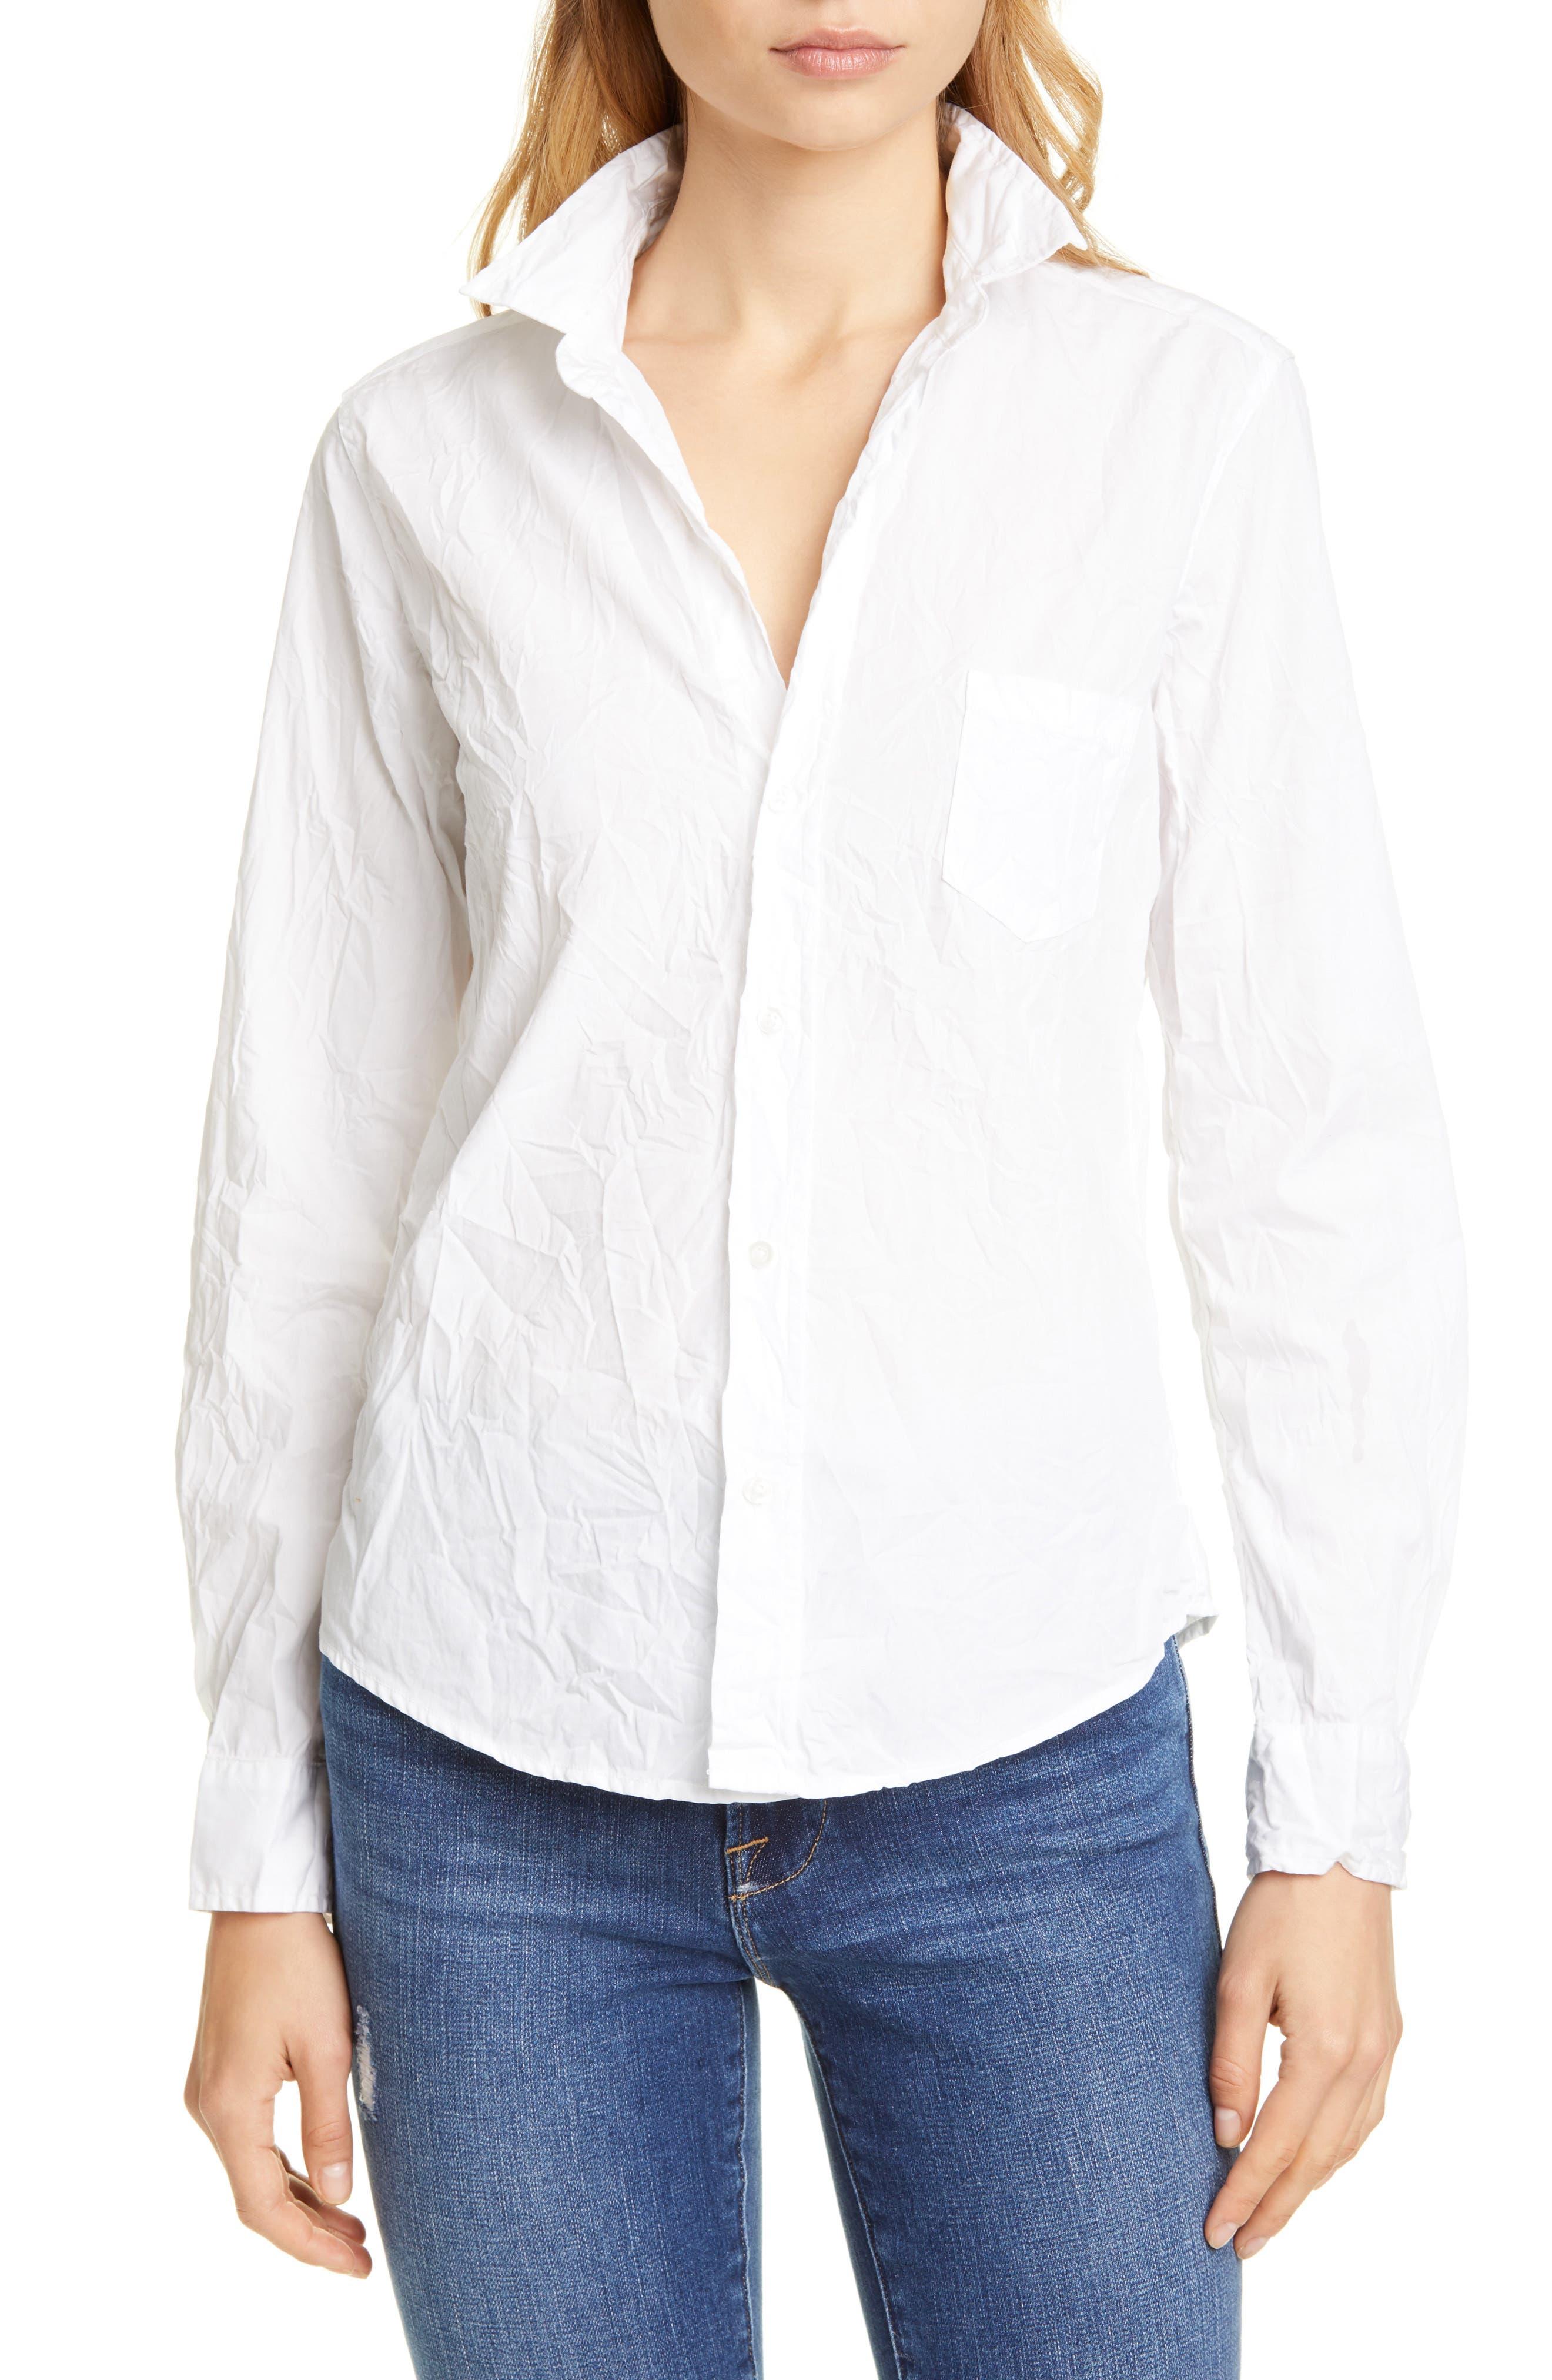 Barry Signature Crinkle Cotton Shirt